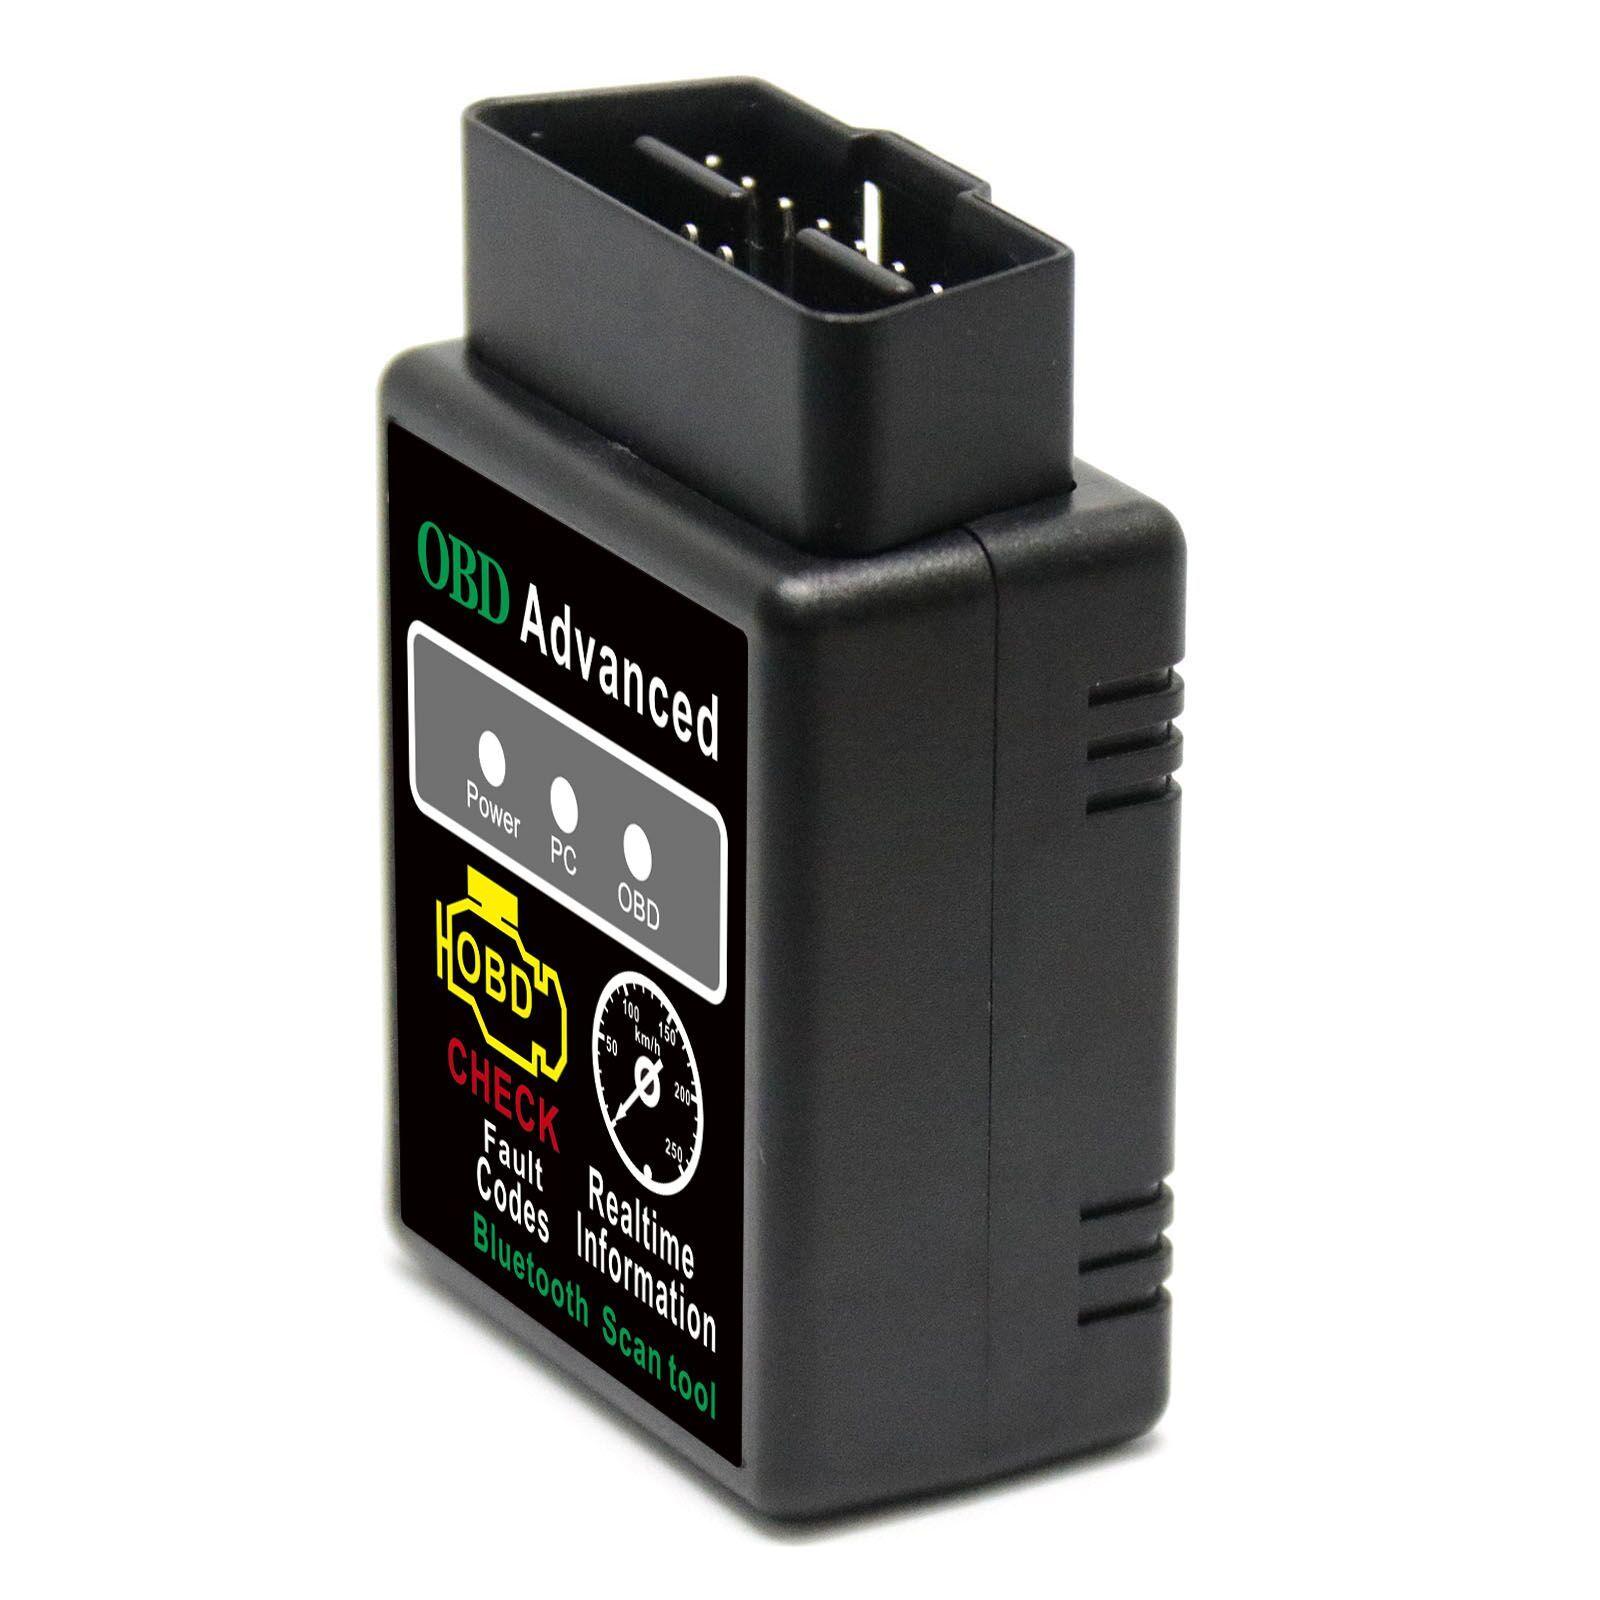 Vgate Scan tool Calidad A + V1.5 Versión 1.5 Super OBD Scan mini elm327 Bluetooth olmo 327 OBDII OBD2 Auto Intercace de diagnóstico